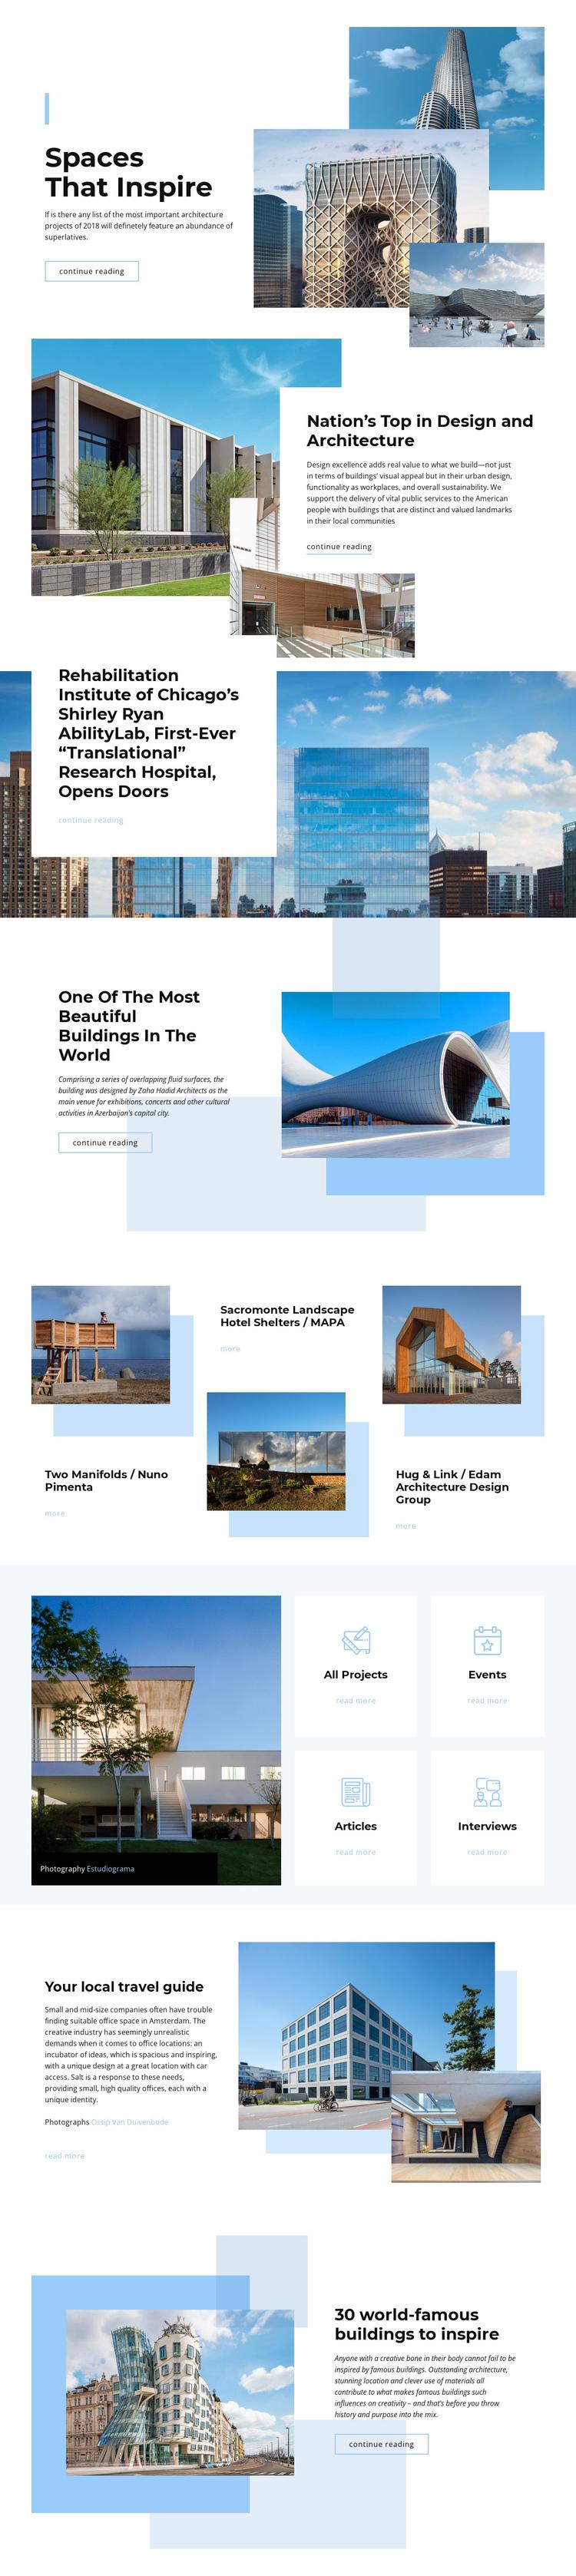 Spaces That Inspire Website Builder Software